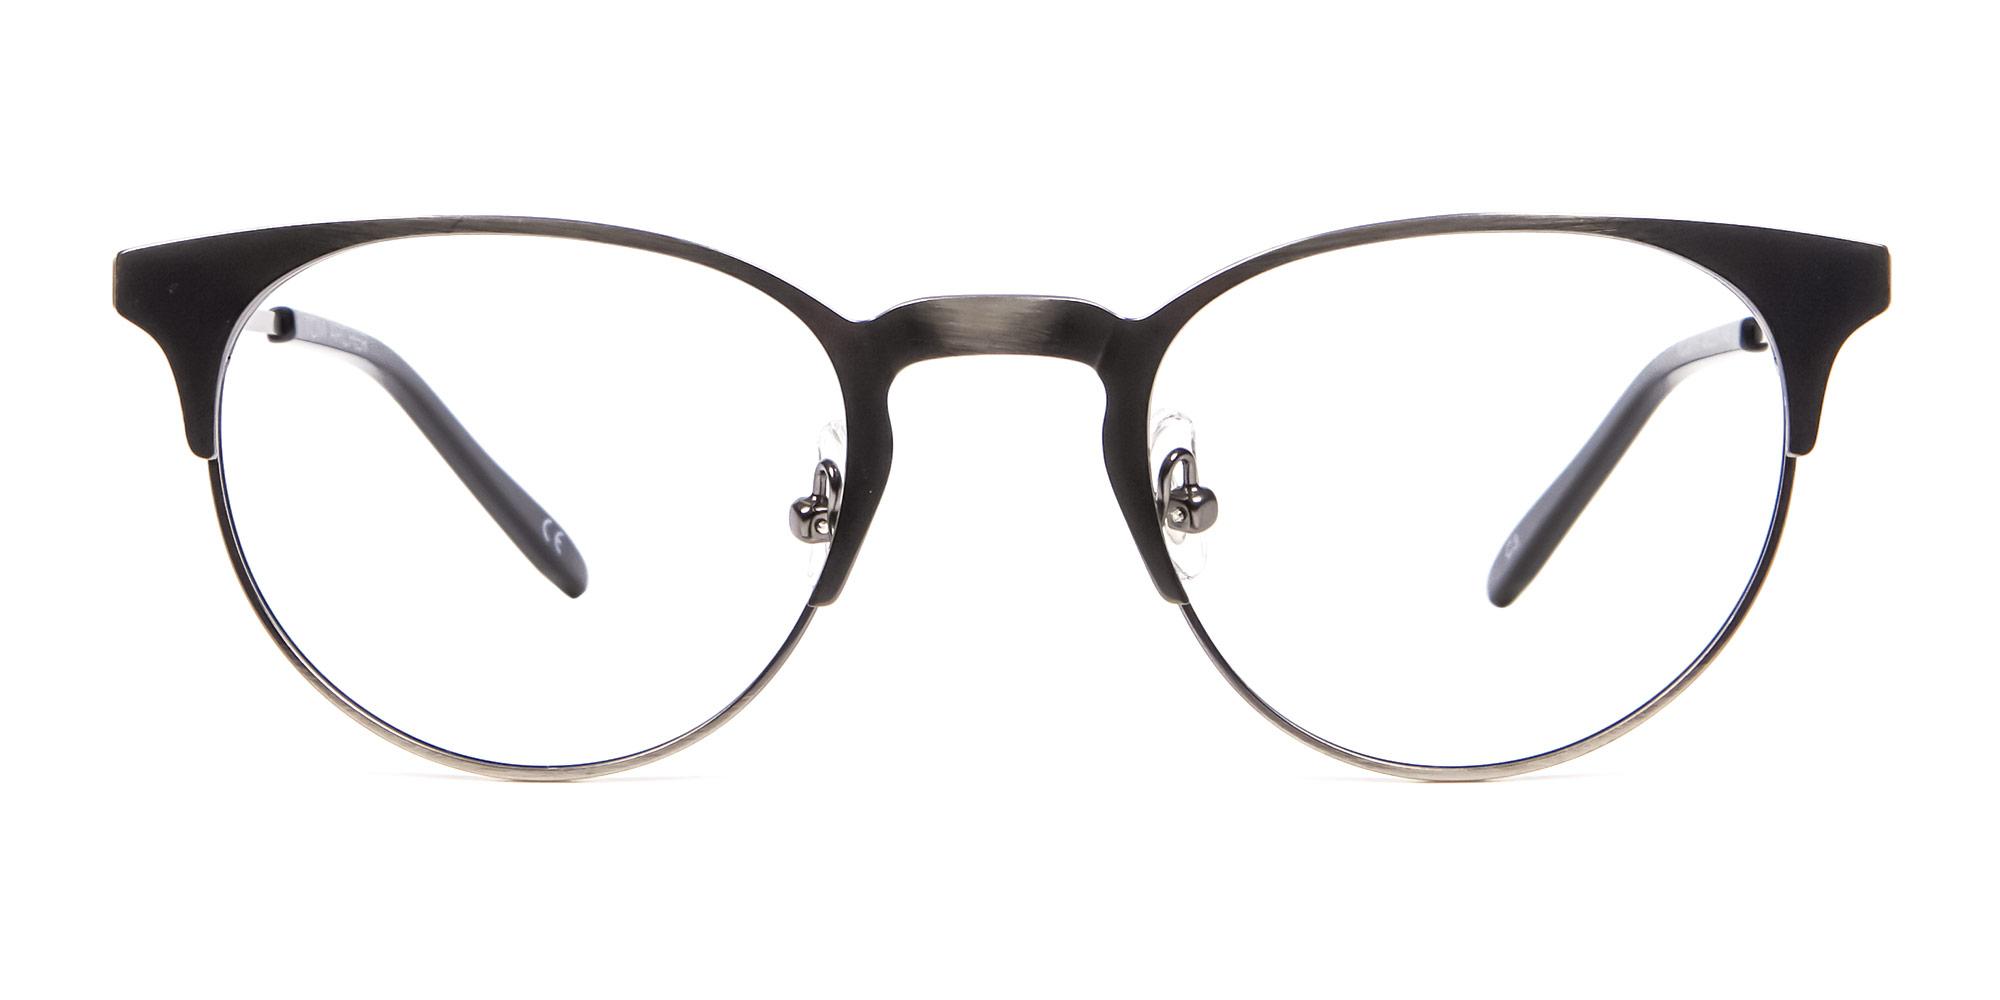 gunmetal cat eye eyeglasses trends 2020